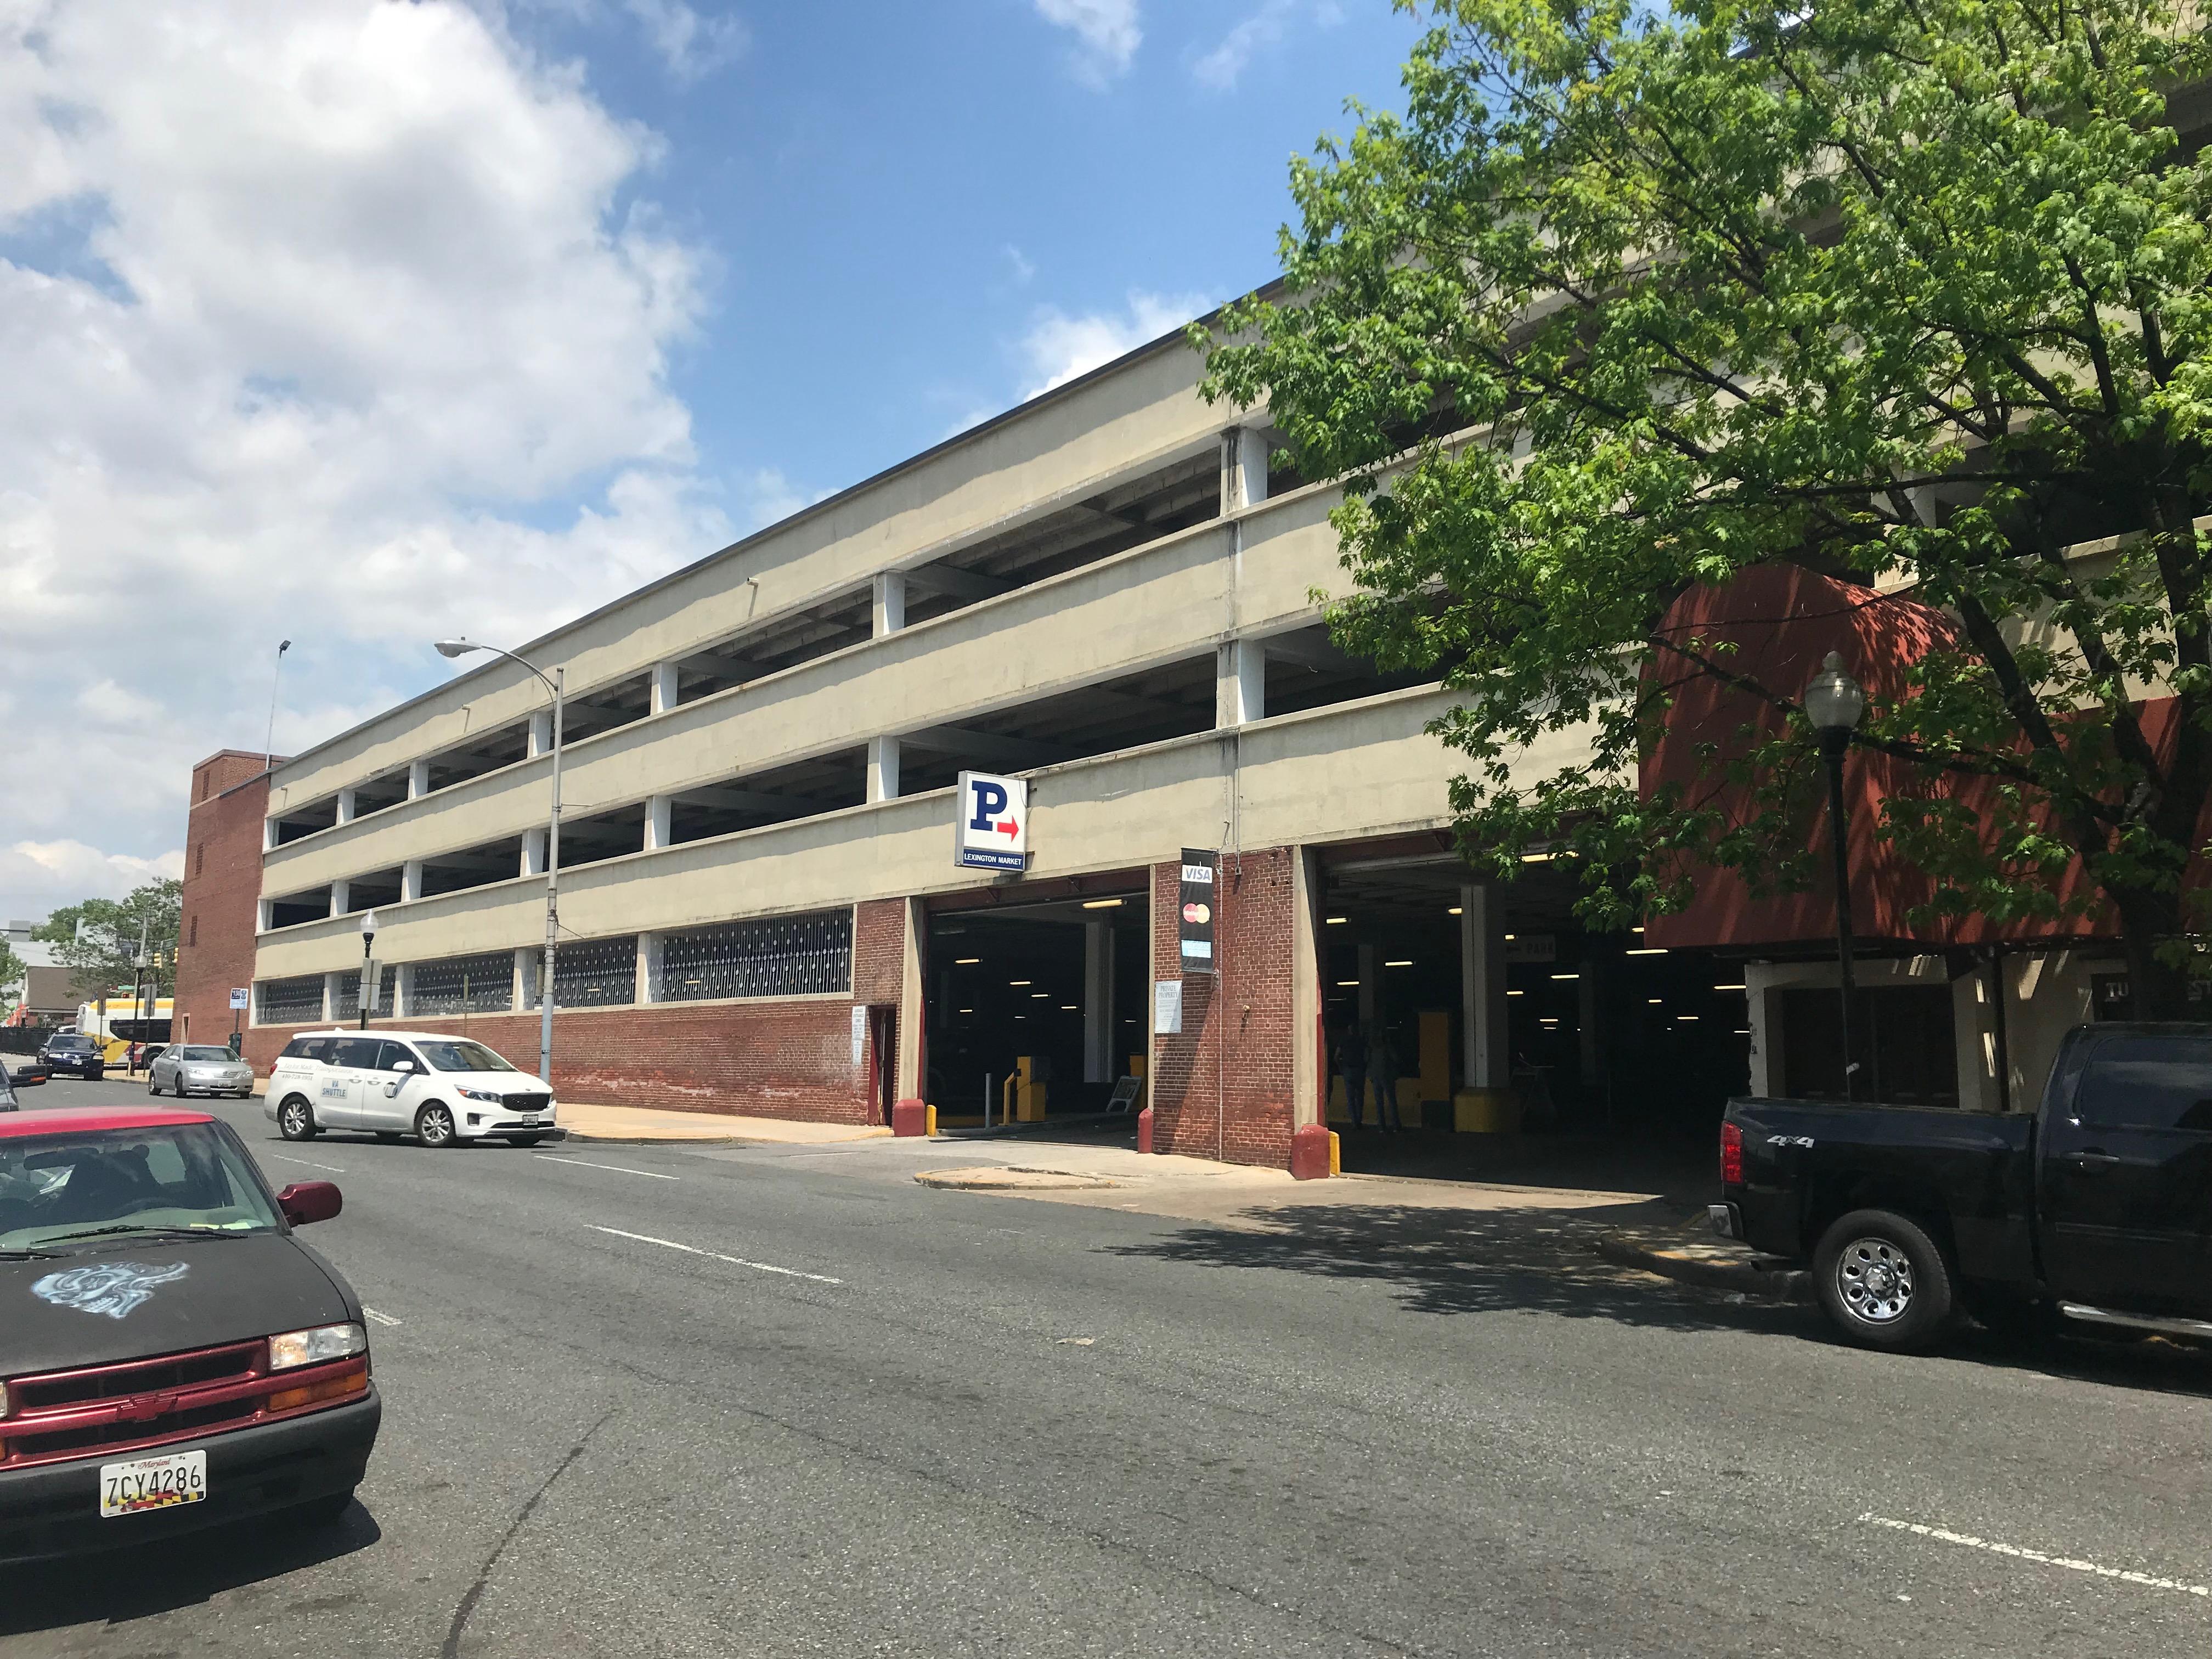 Greene street entrance, lexington market parking garage, 520 w. lexington street, baltimore, md 21201 photo